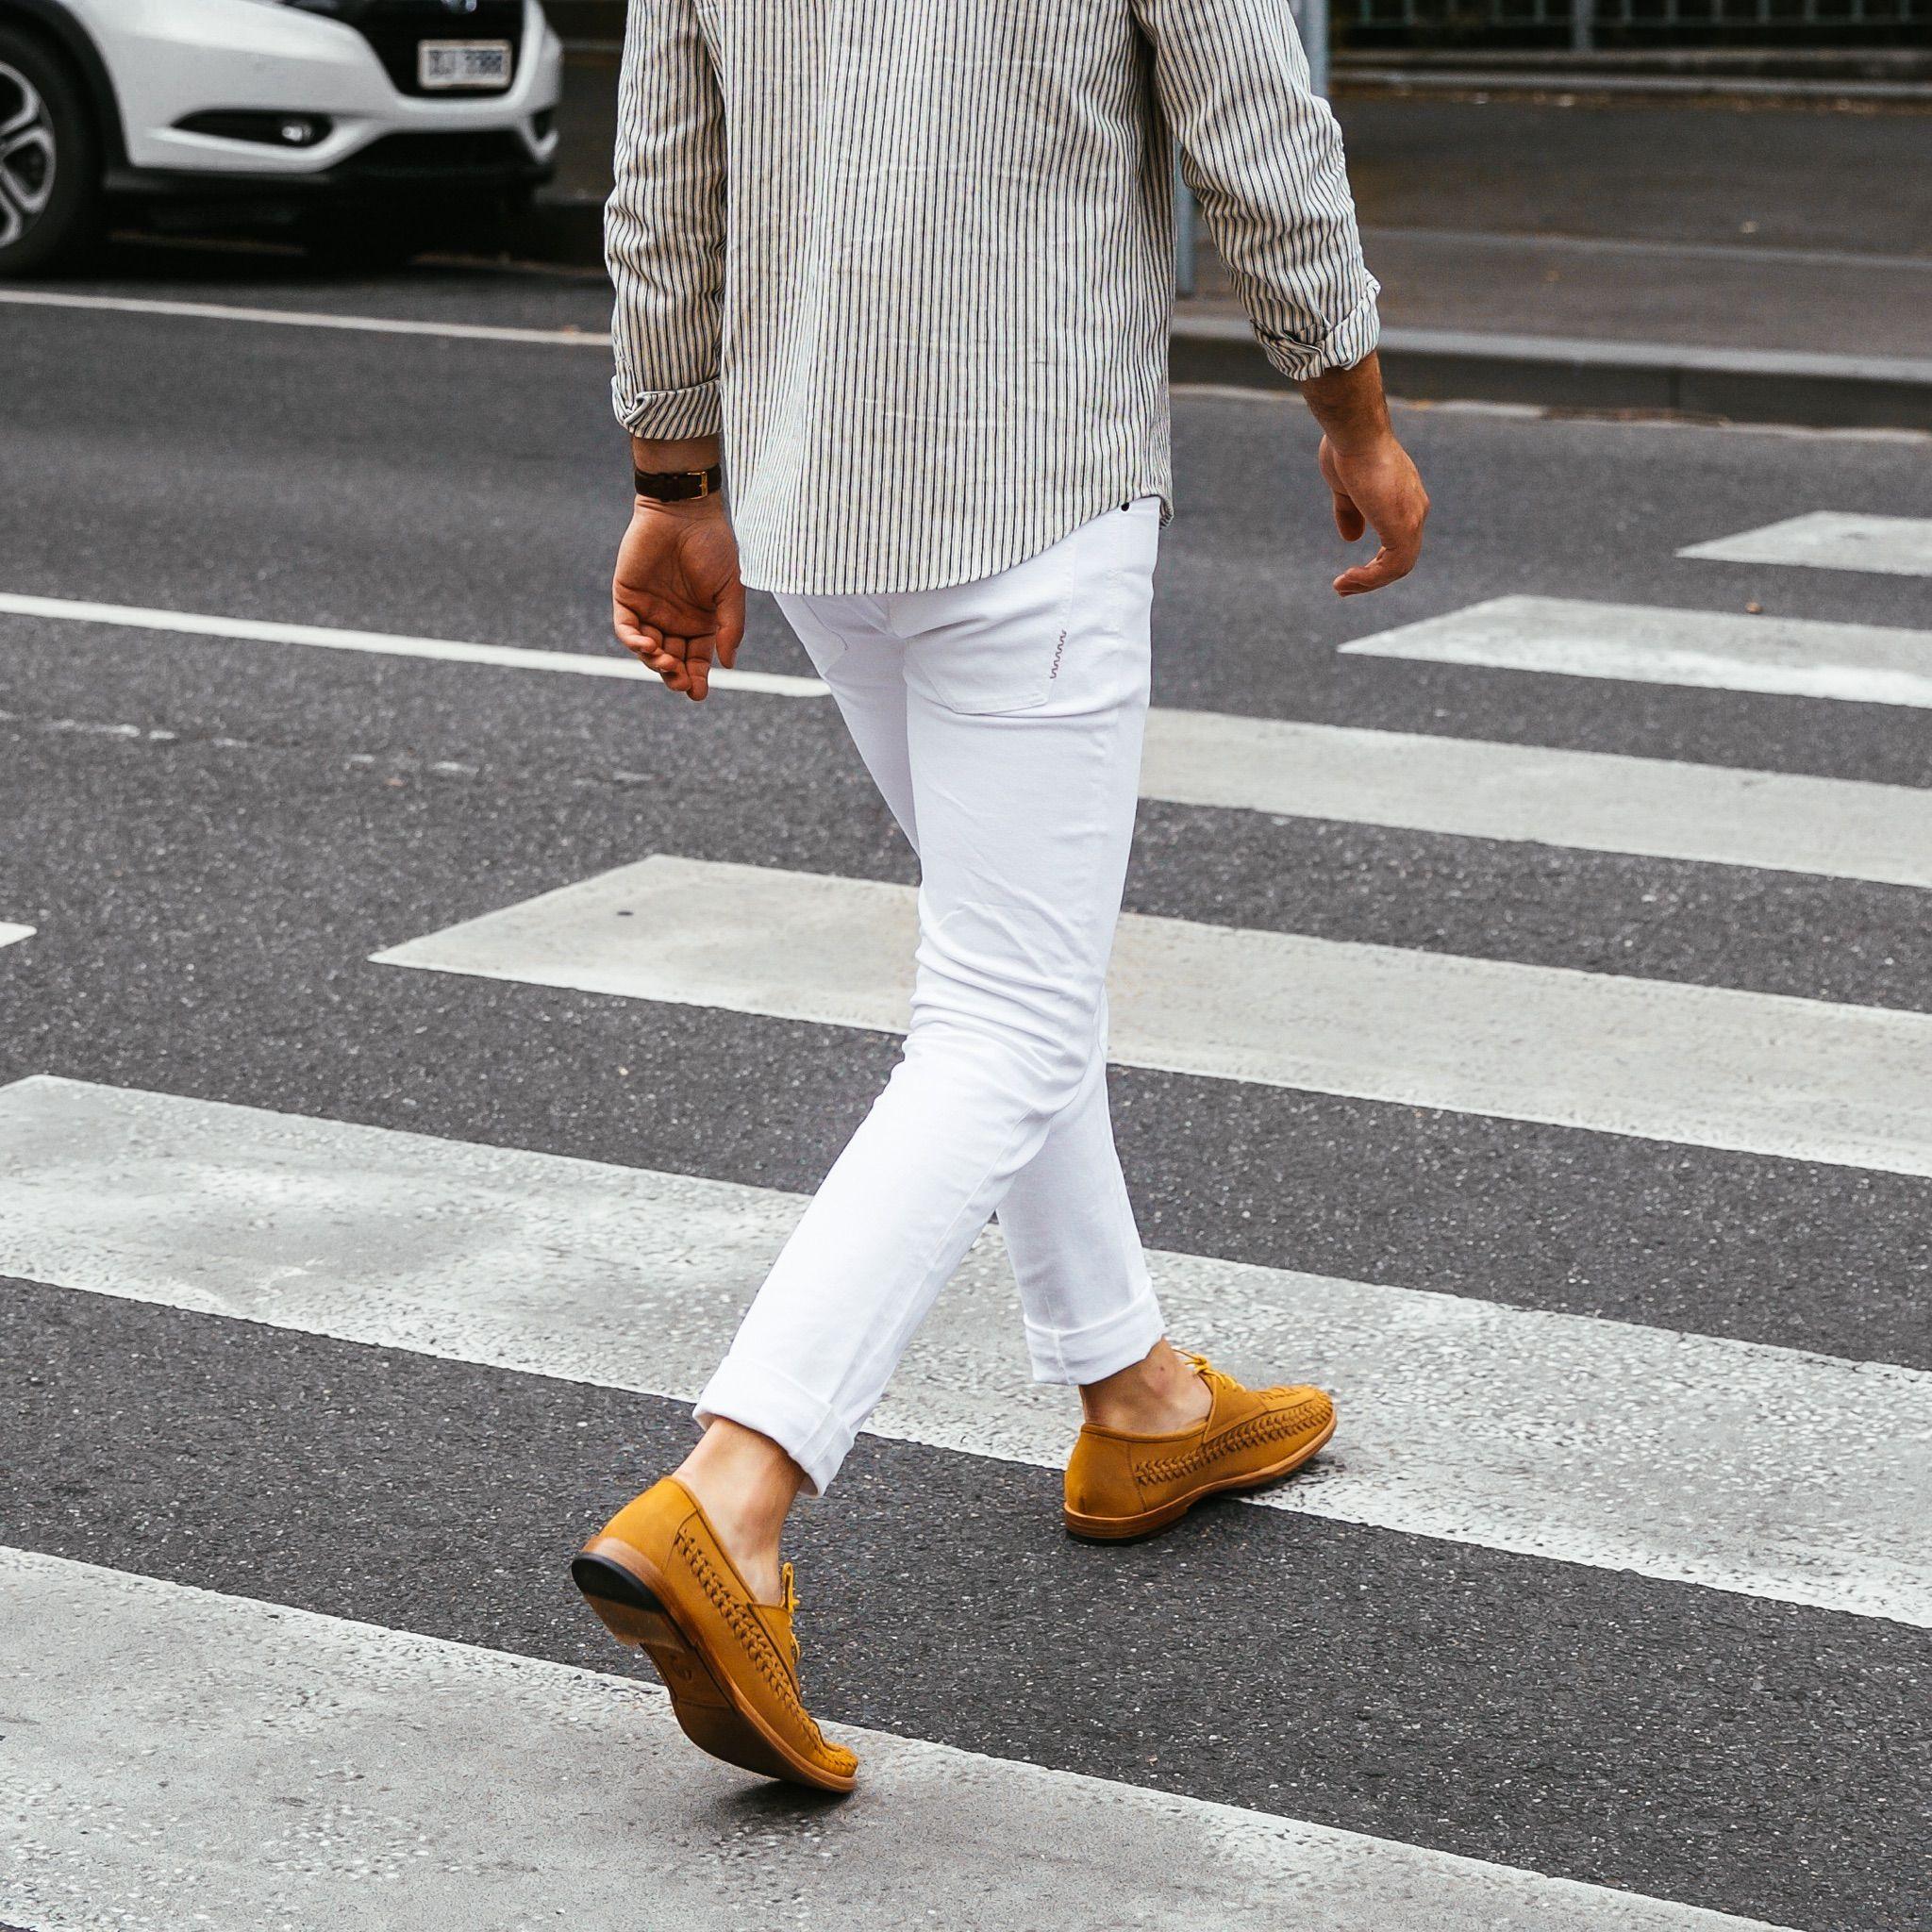 Bared_Footwear_Shaun_Lyle_Mens_Potassium_Woven_Desert_Nubuck_Lace_Ups